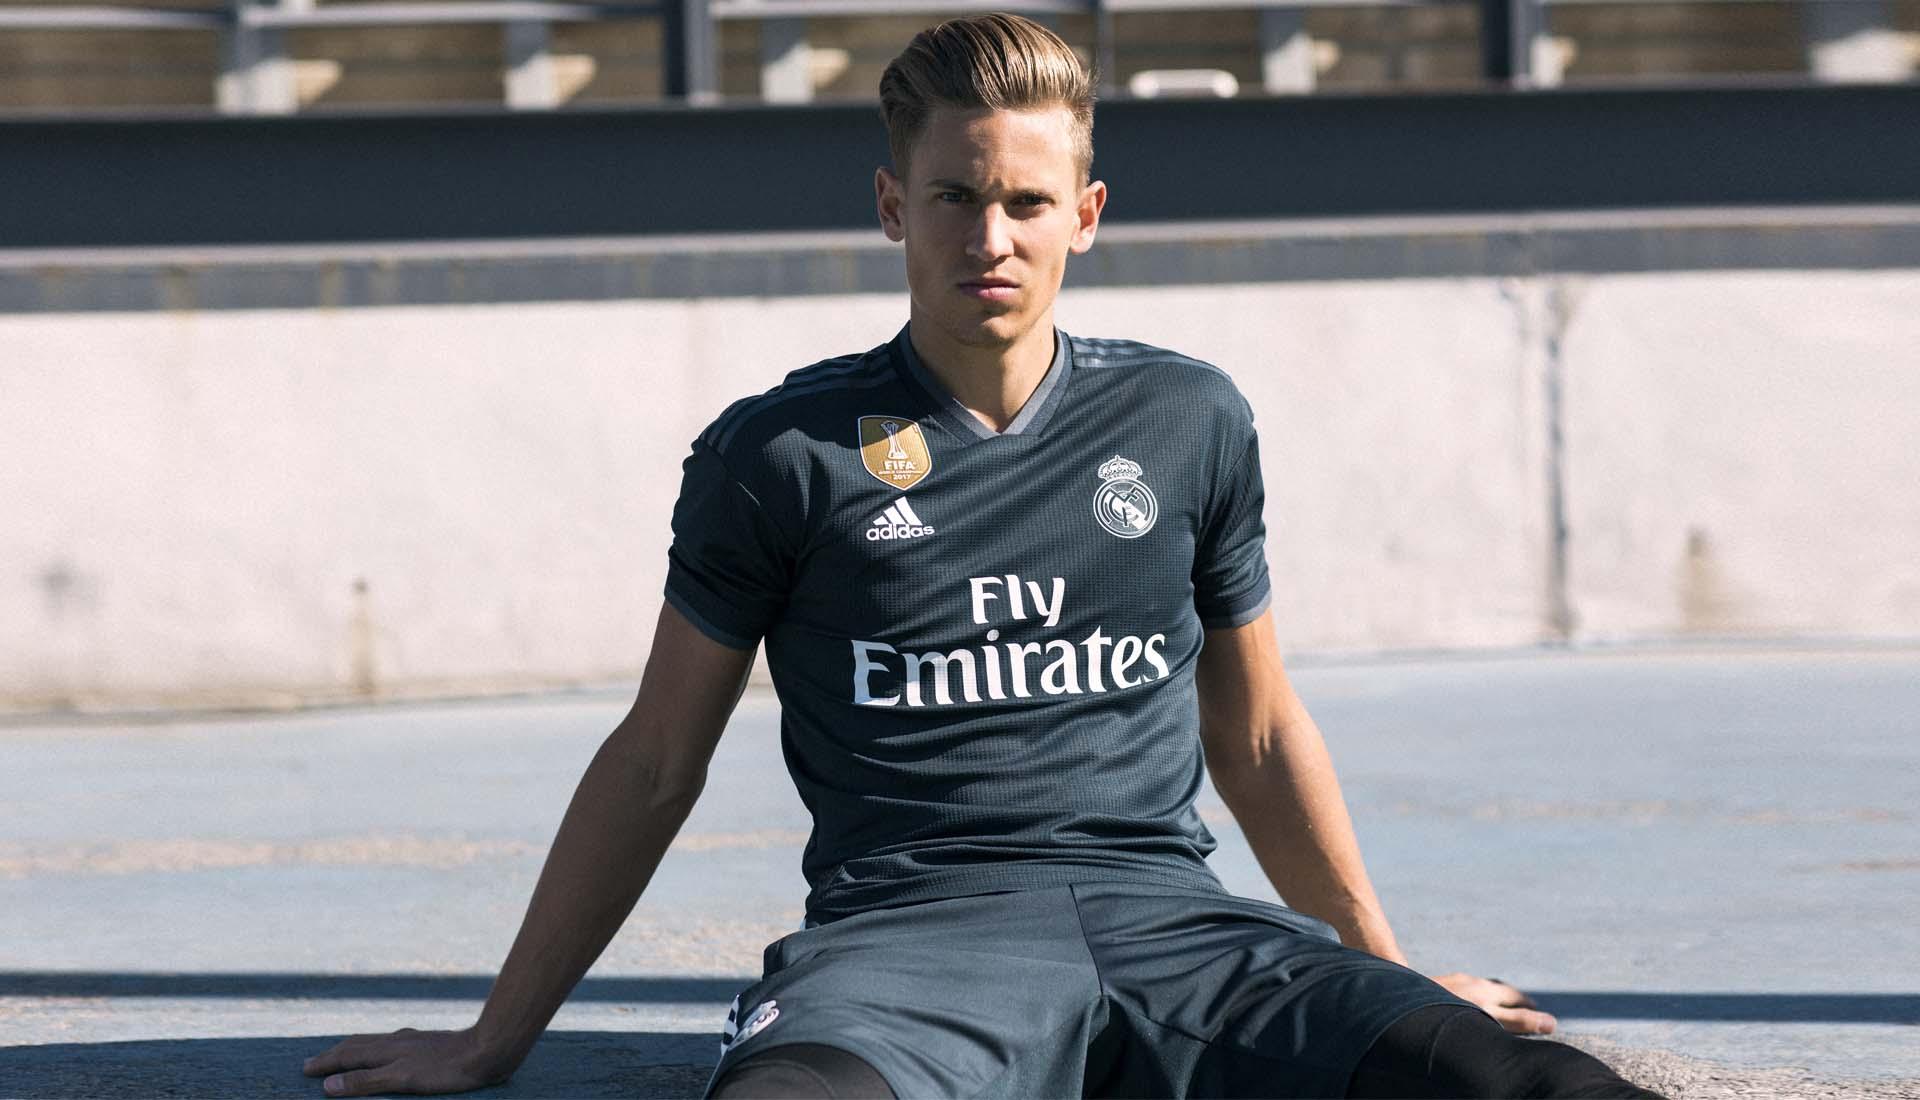 Maillot-Real-Madrid-Exterieur-Saison-18-19